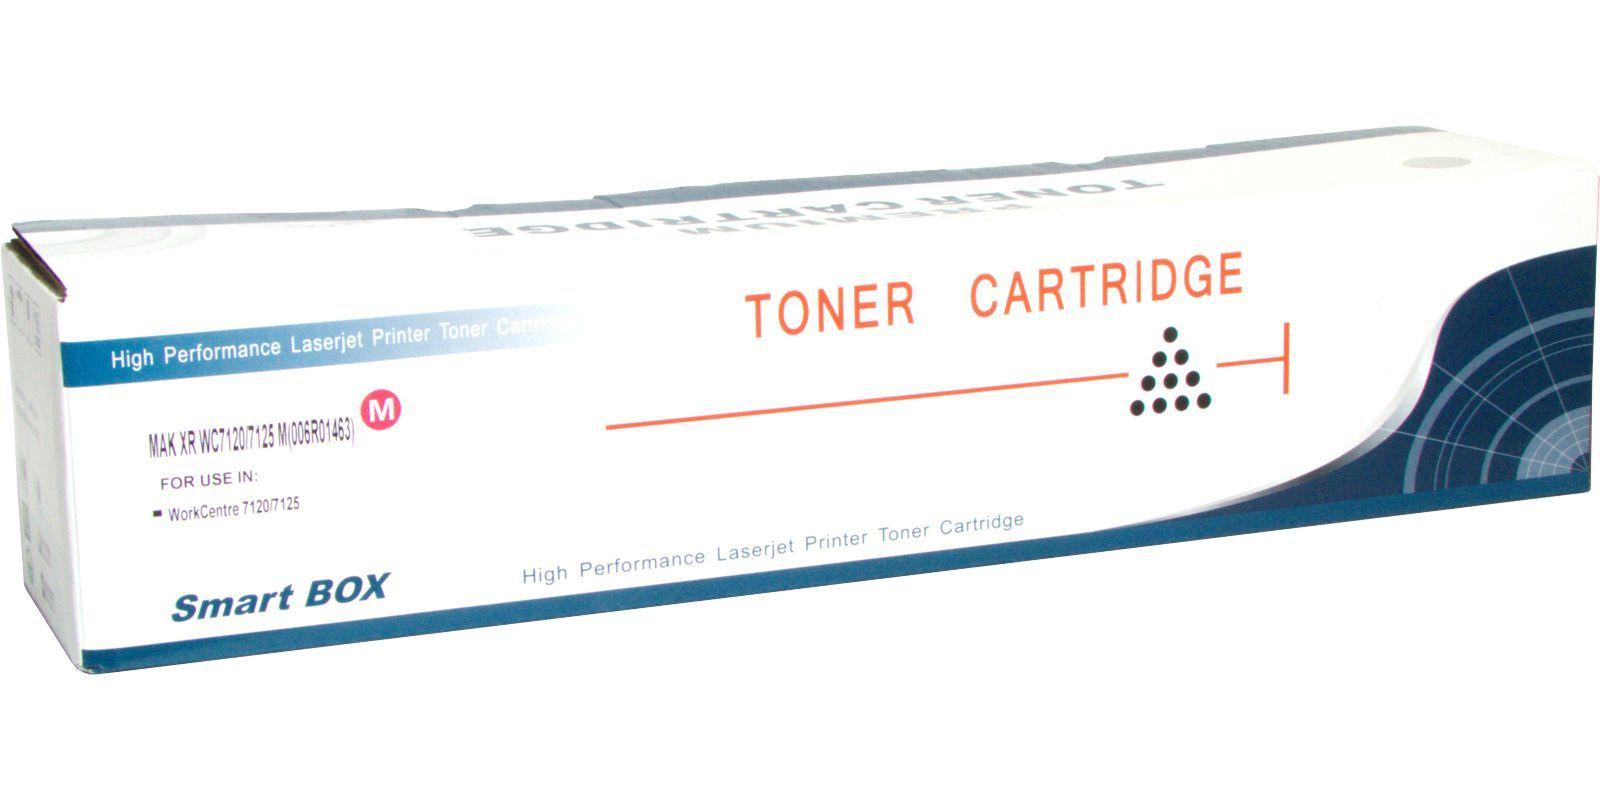 Картридж Туба MAK© WC7120 (006R01463) пурпурный (magenta), до 15000 стр.